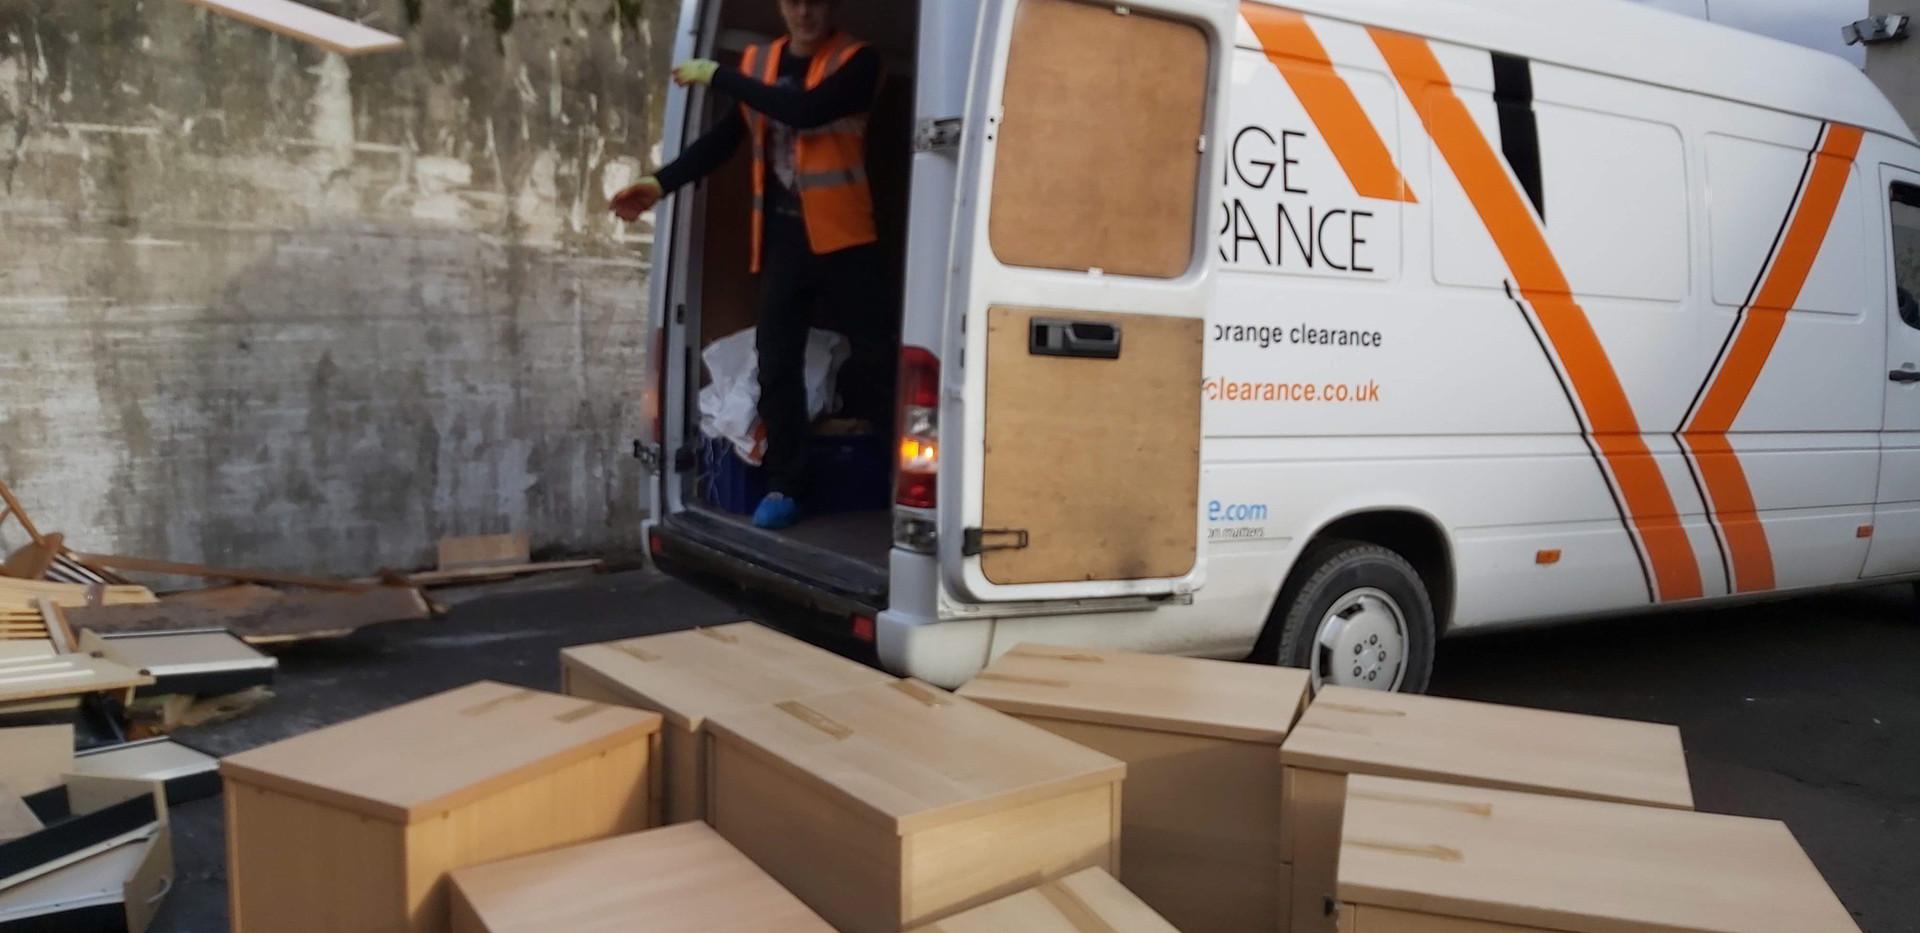 Business furniture disposal in Kirkstall